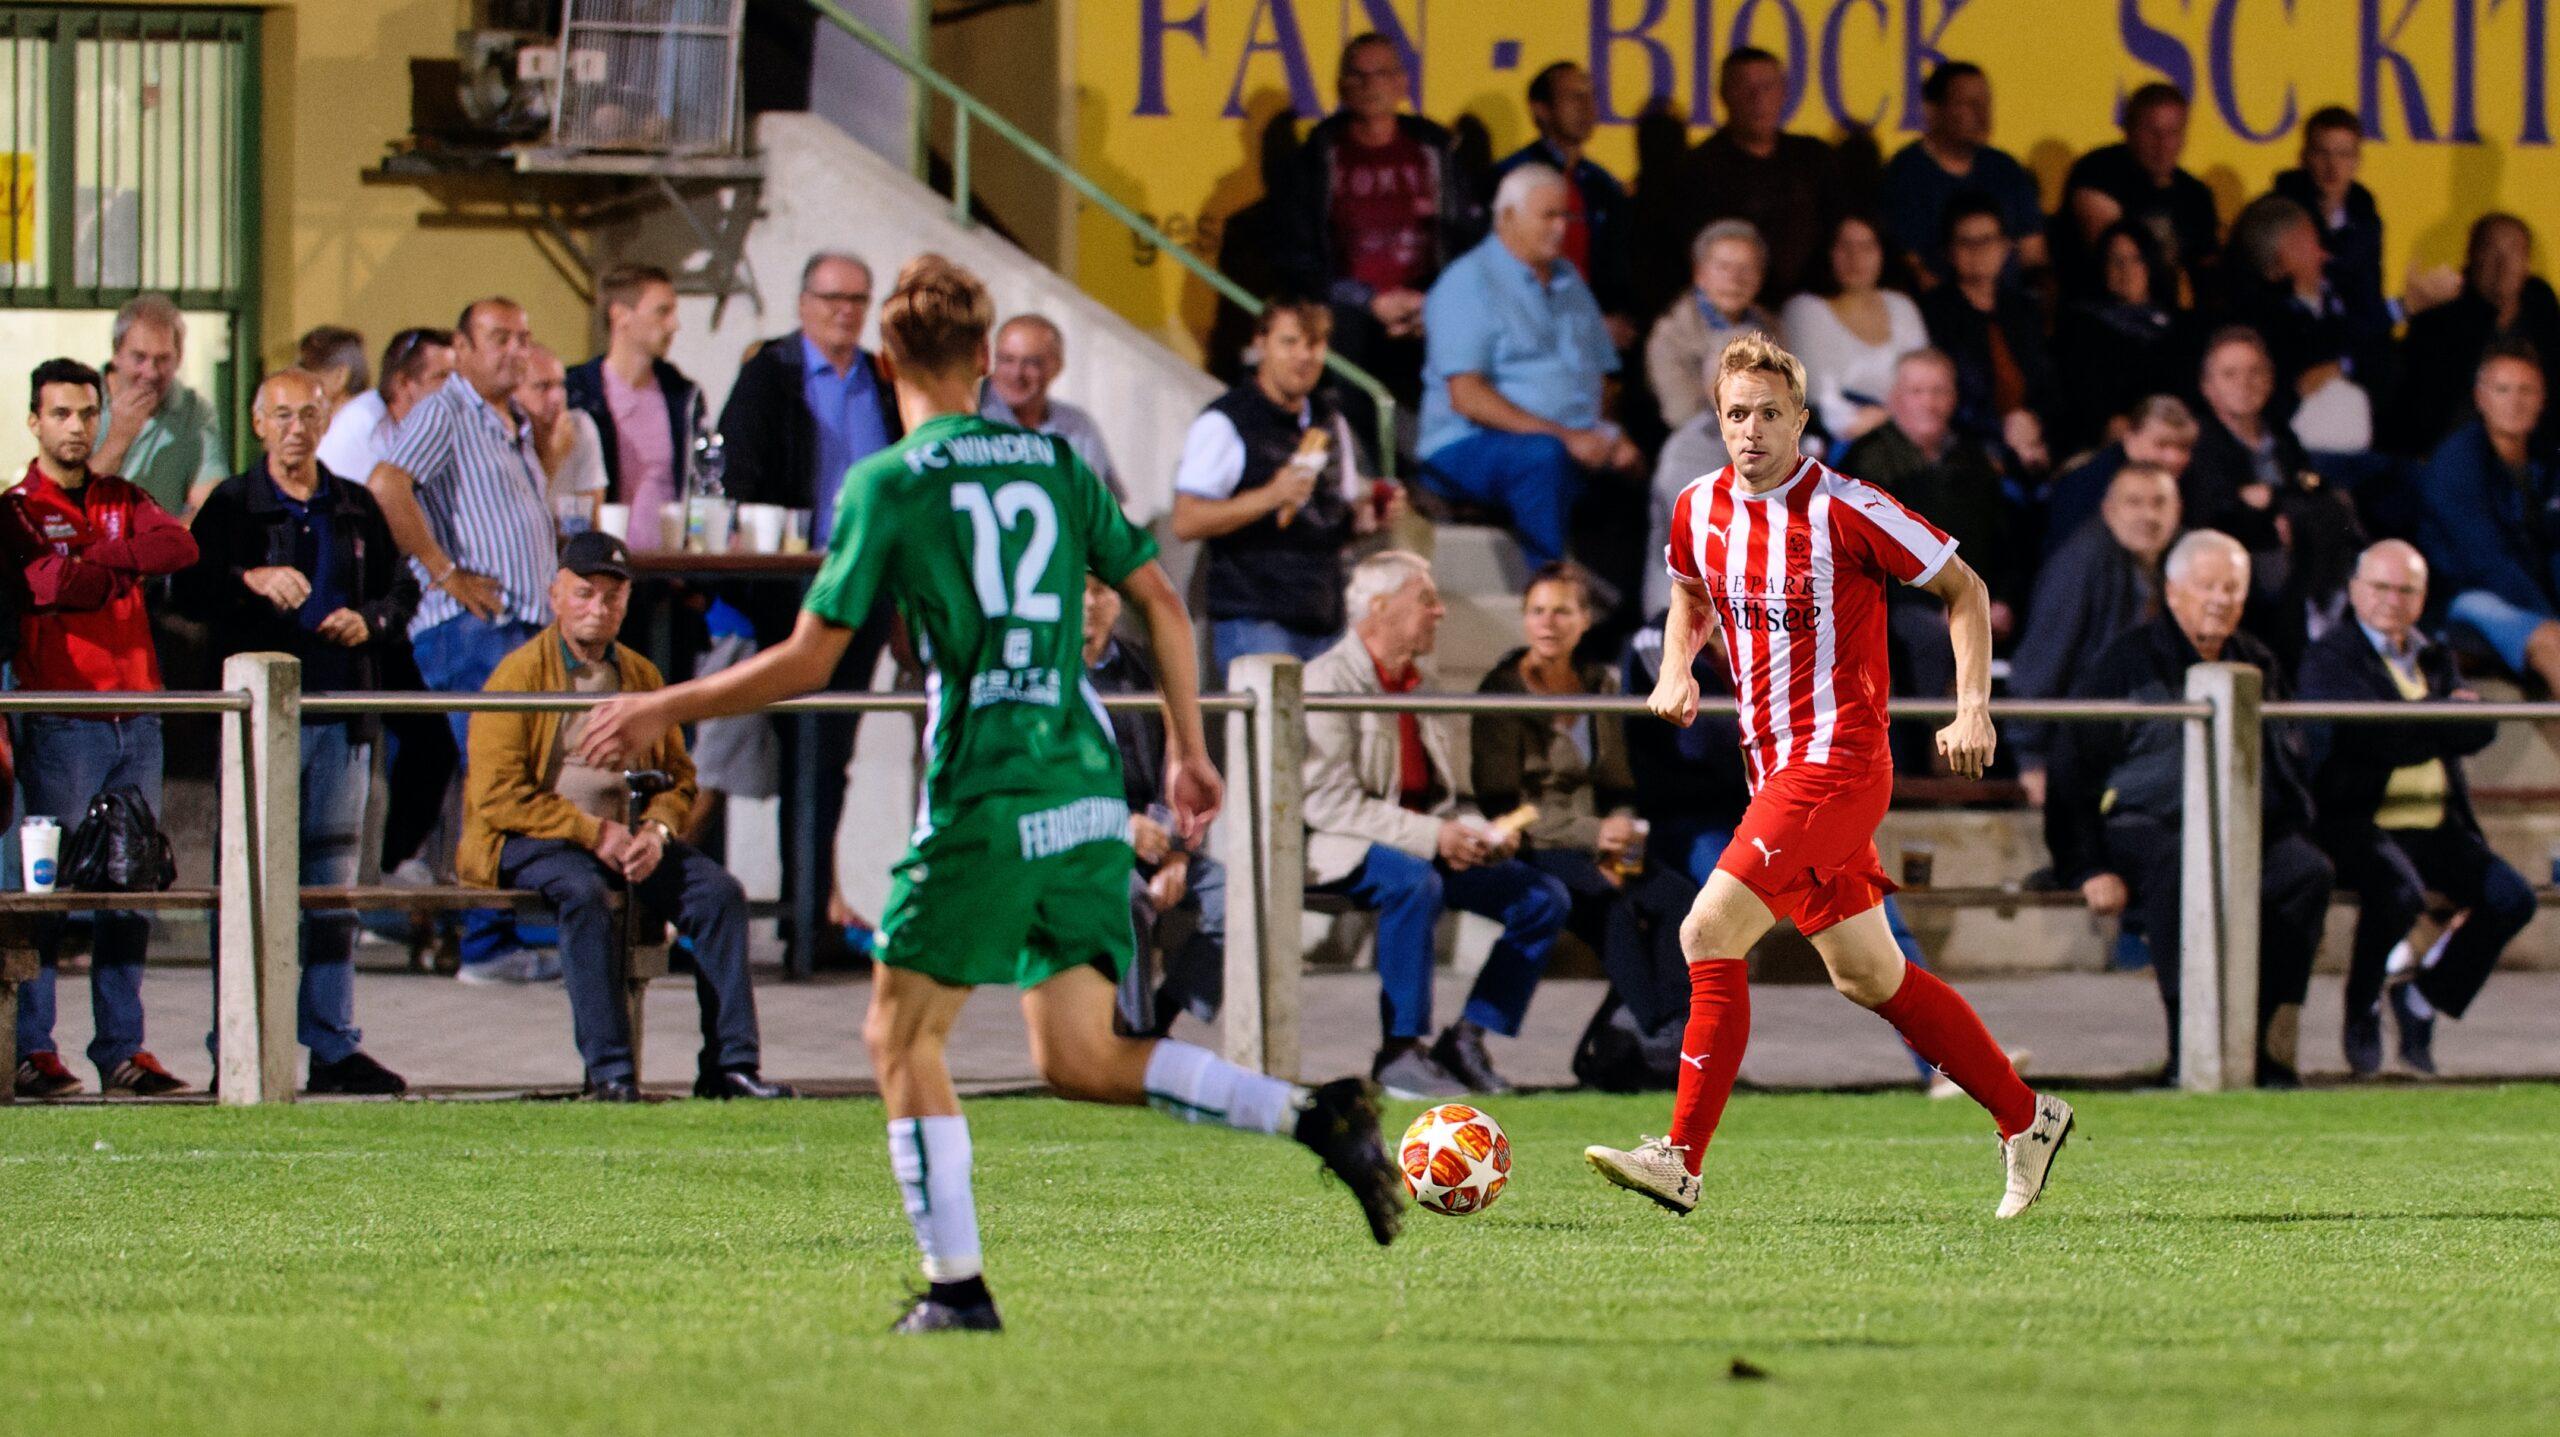 Peter Barinece in midfield